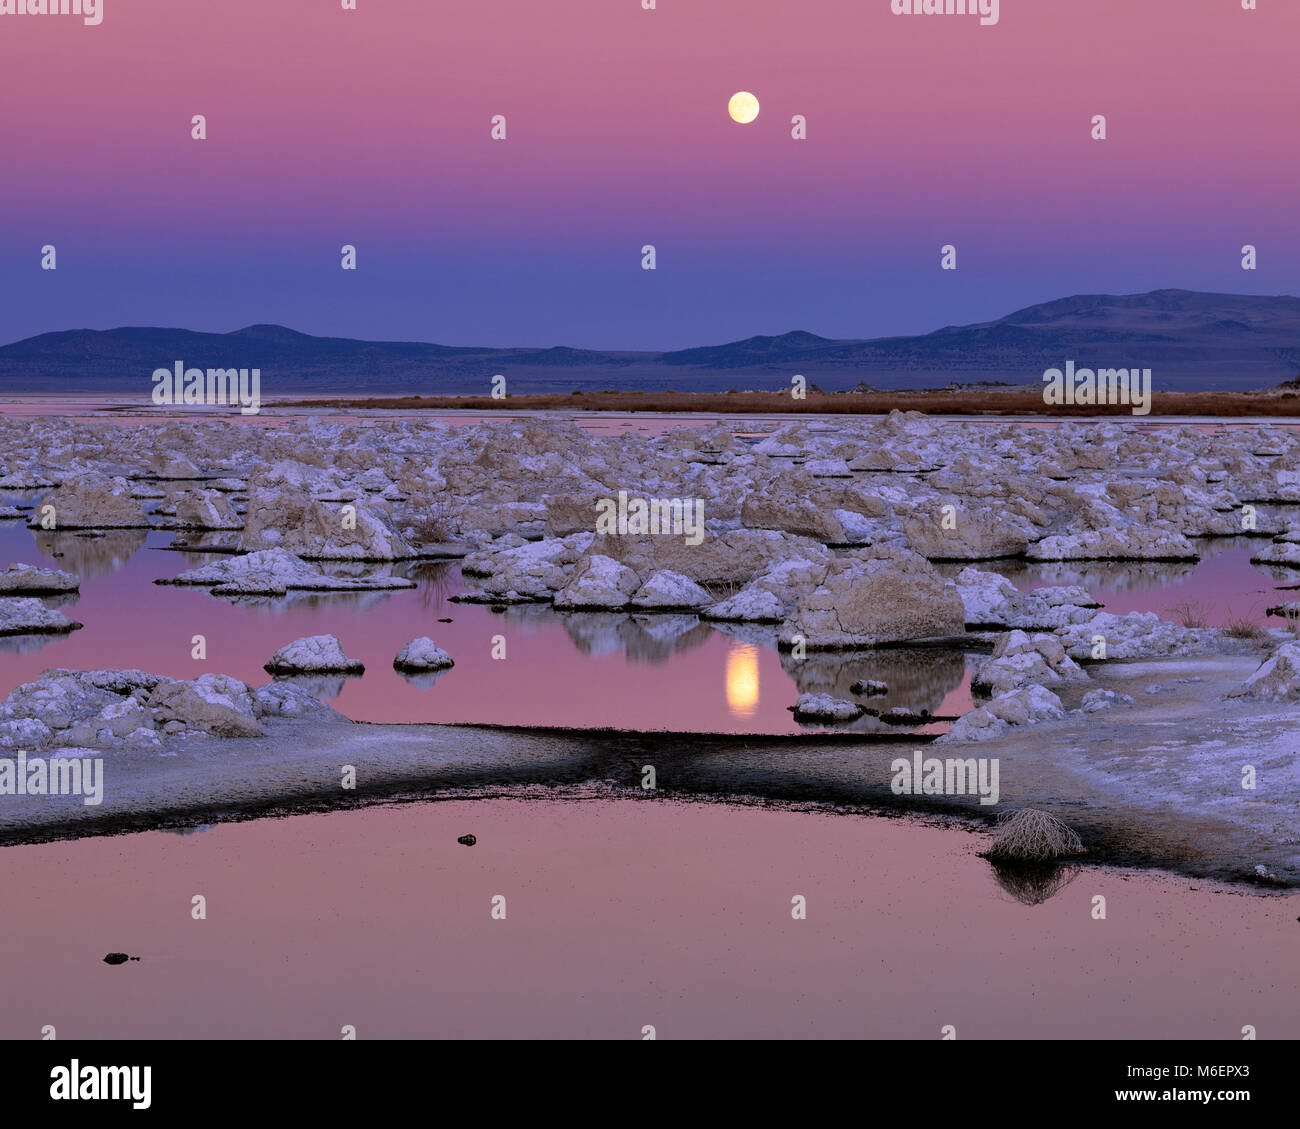 Luna, el Lago Mono, Mono Basin National Forest, área escénica nacional Inyo Forest, California Imagen De Stock